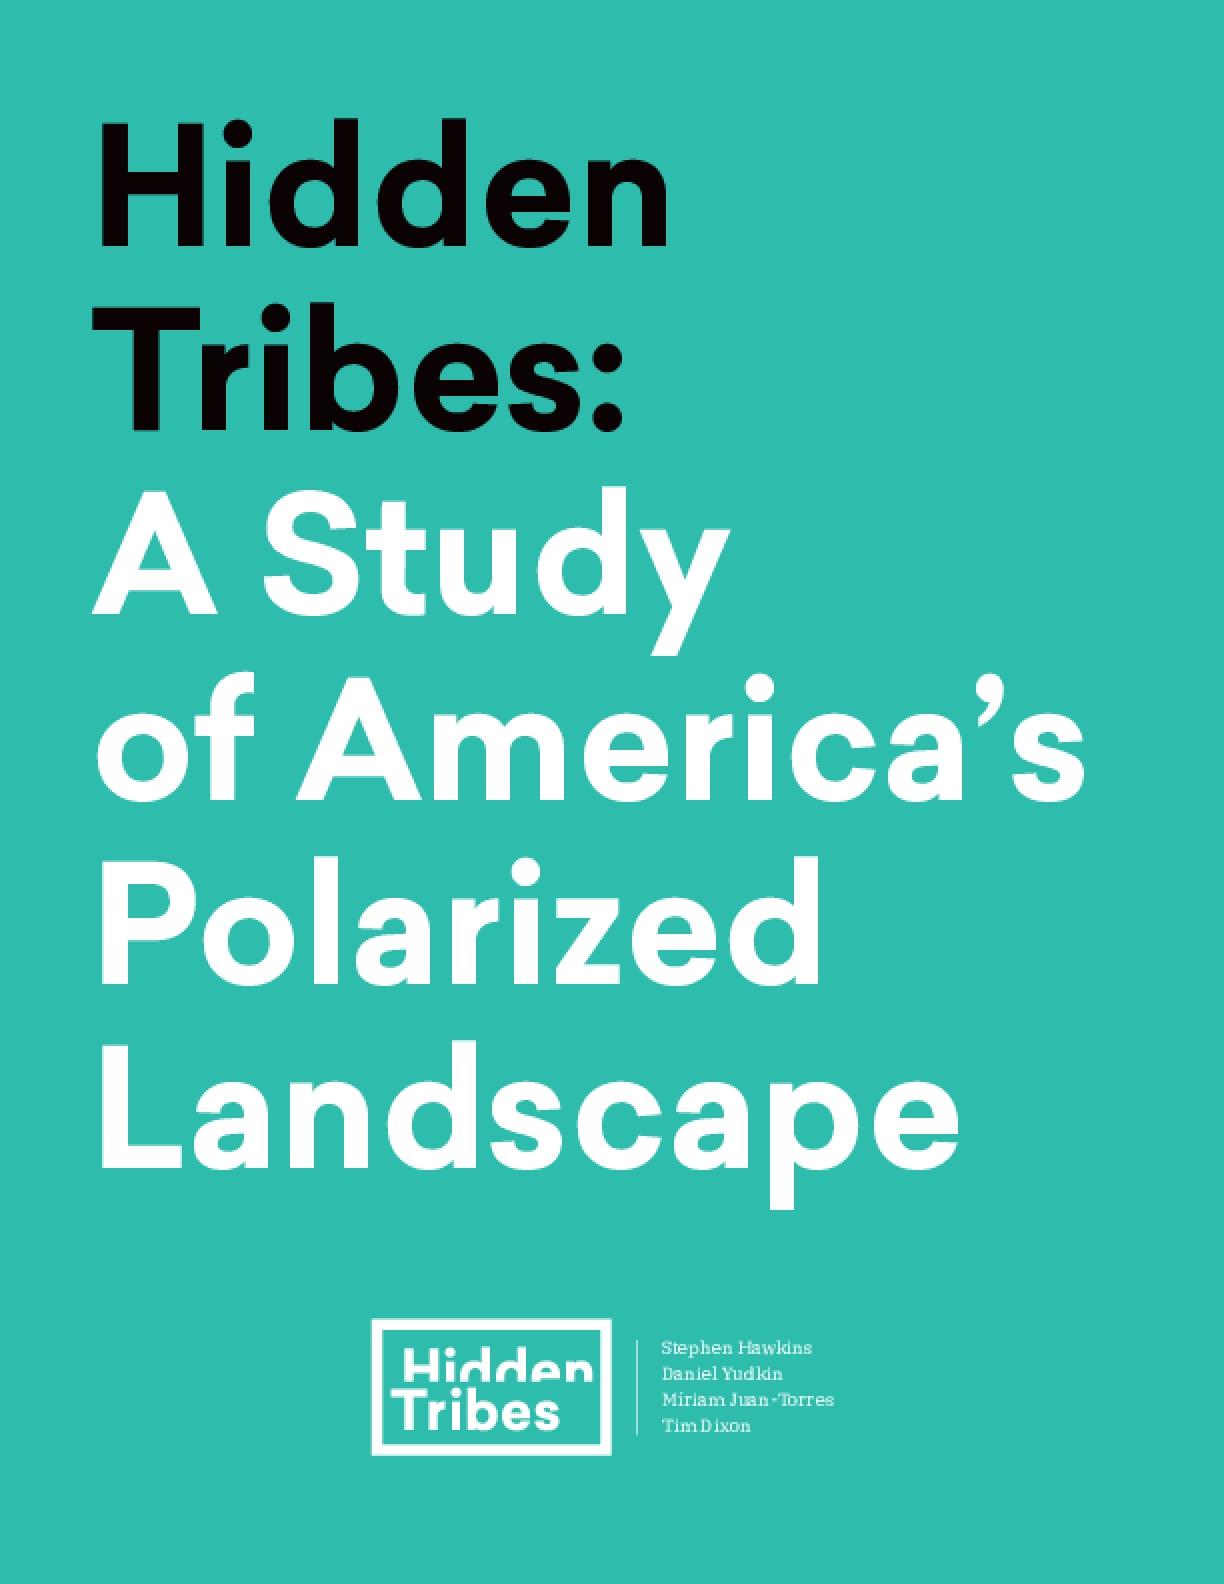 Hidden Tribes: A Study of America's Polarized Landscape